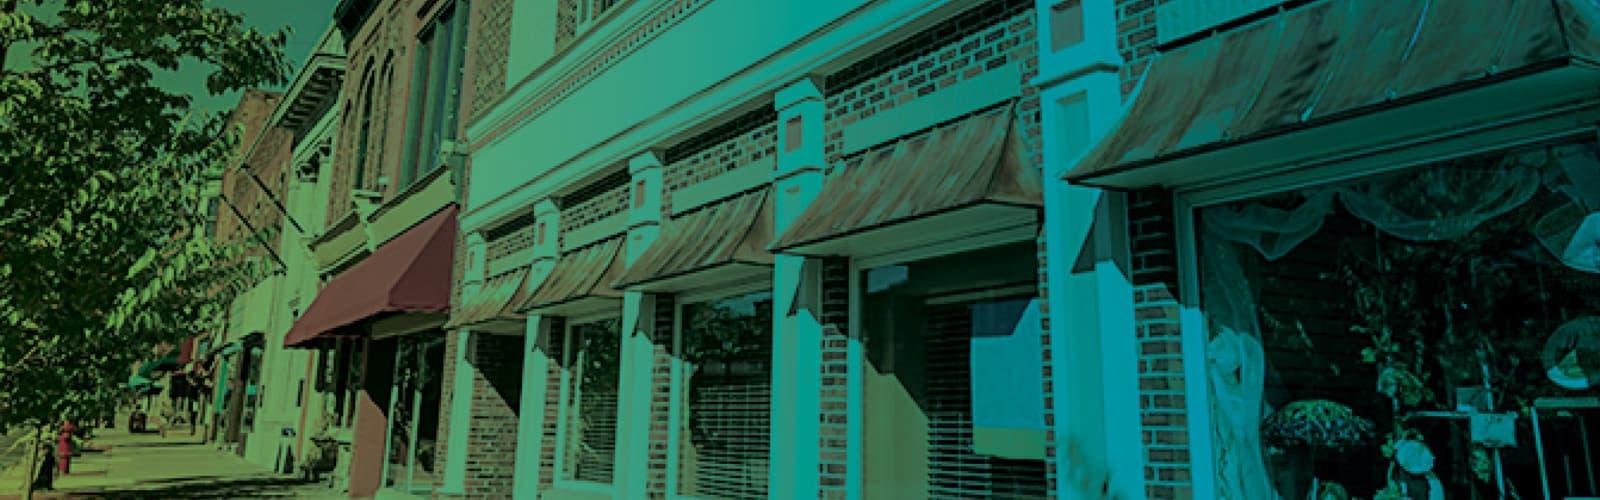 Main Street America Image